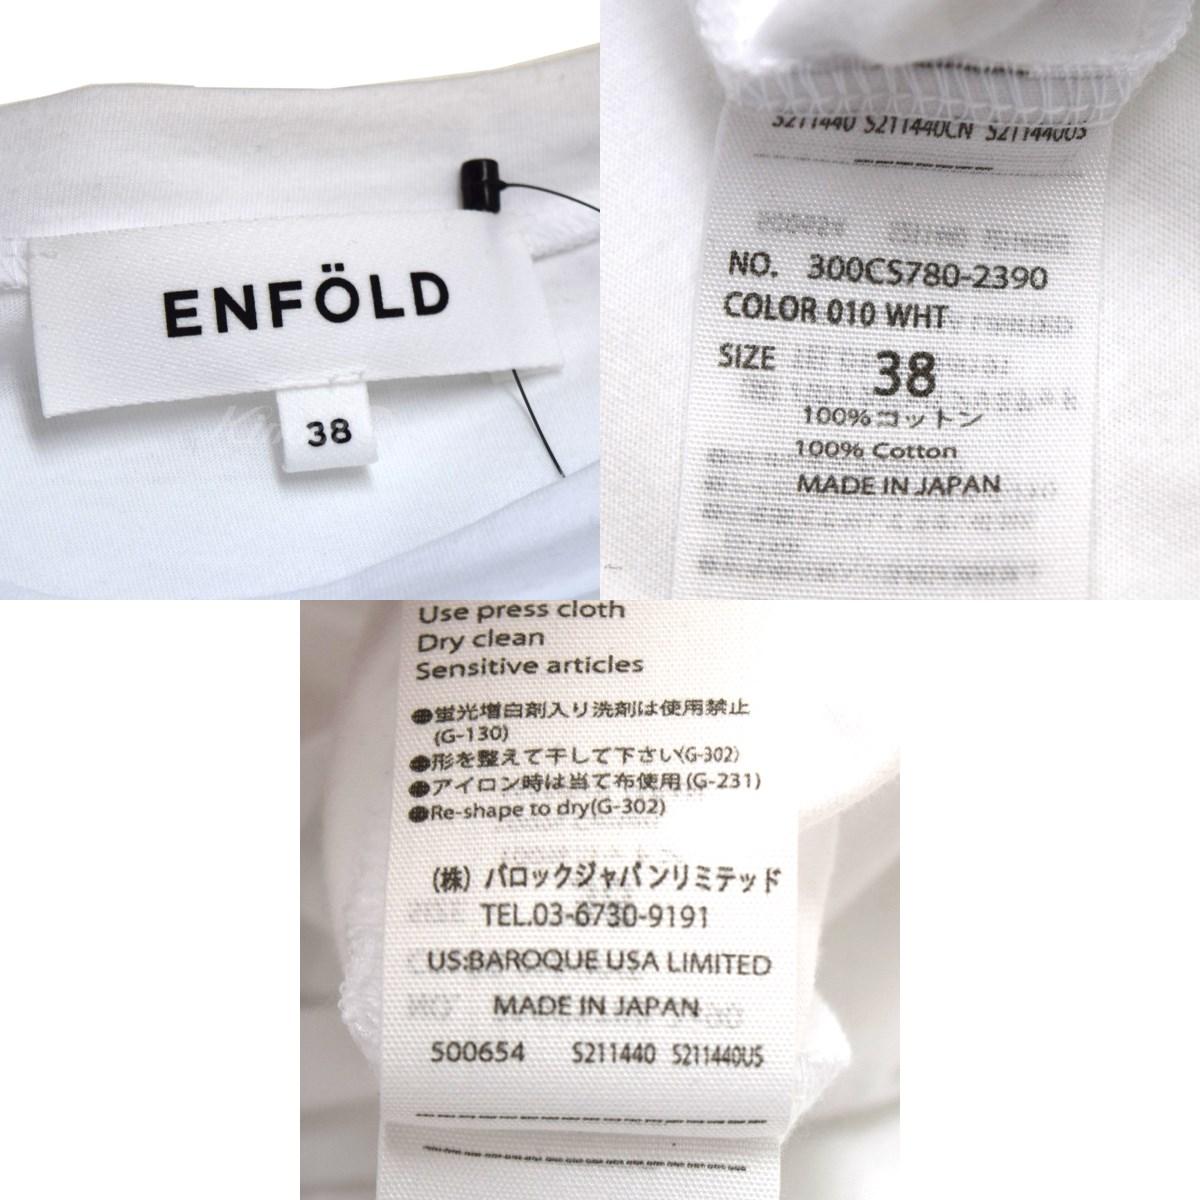 ENFOLD タックTシャツ ホワイト サイズ 38090919エンフォルドdtQCrhs